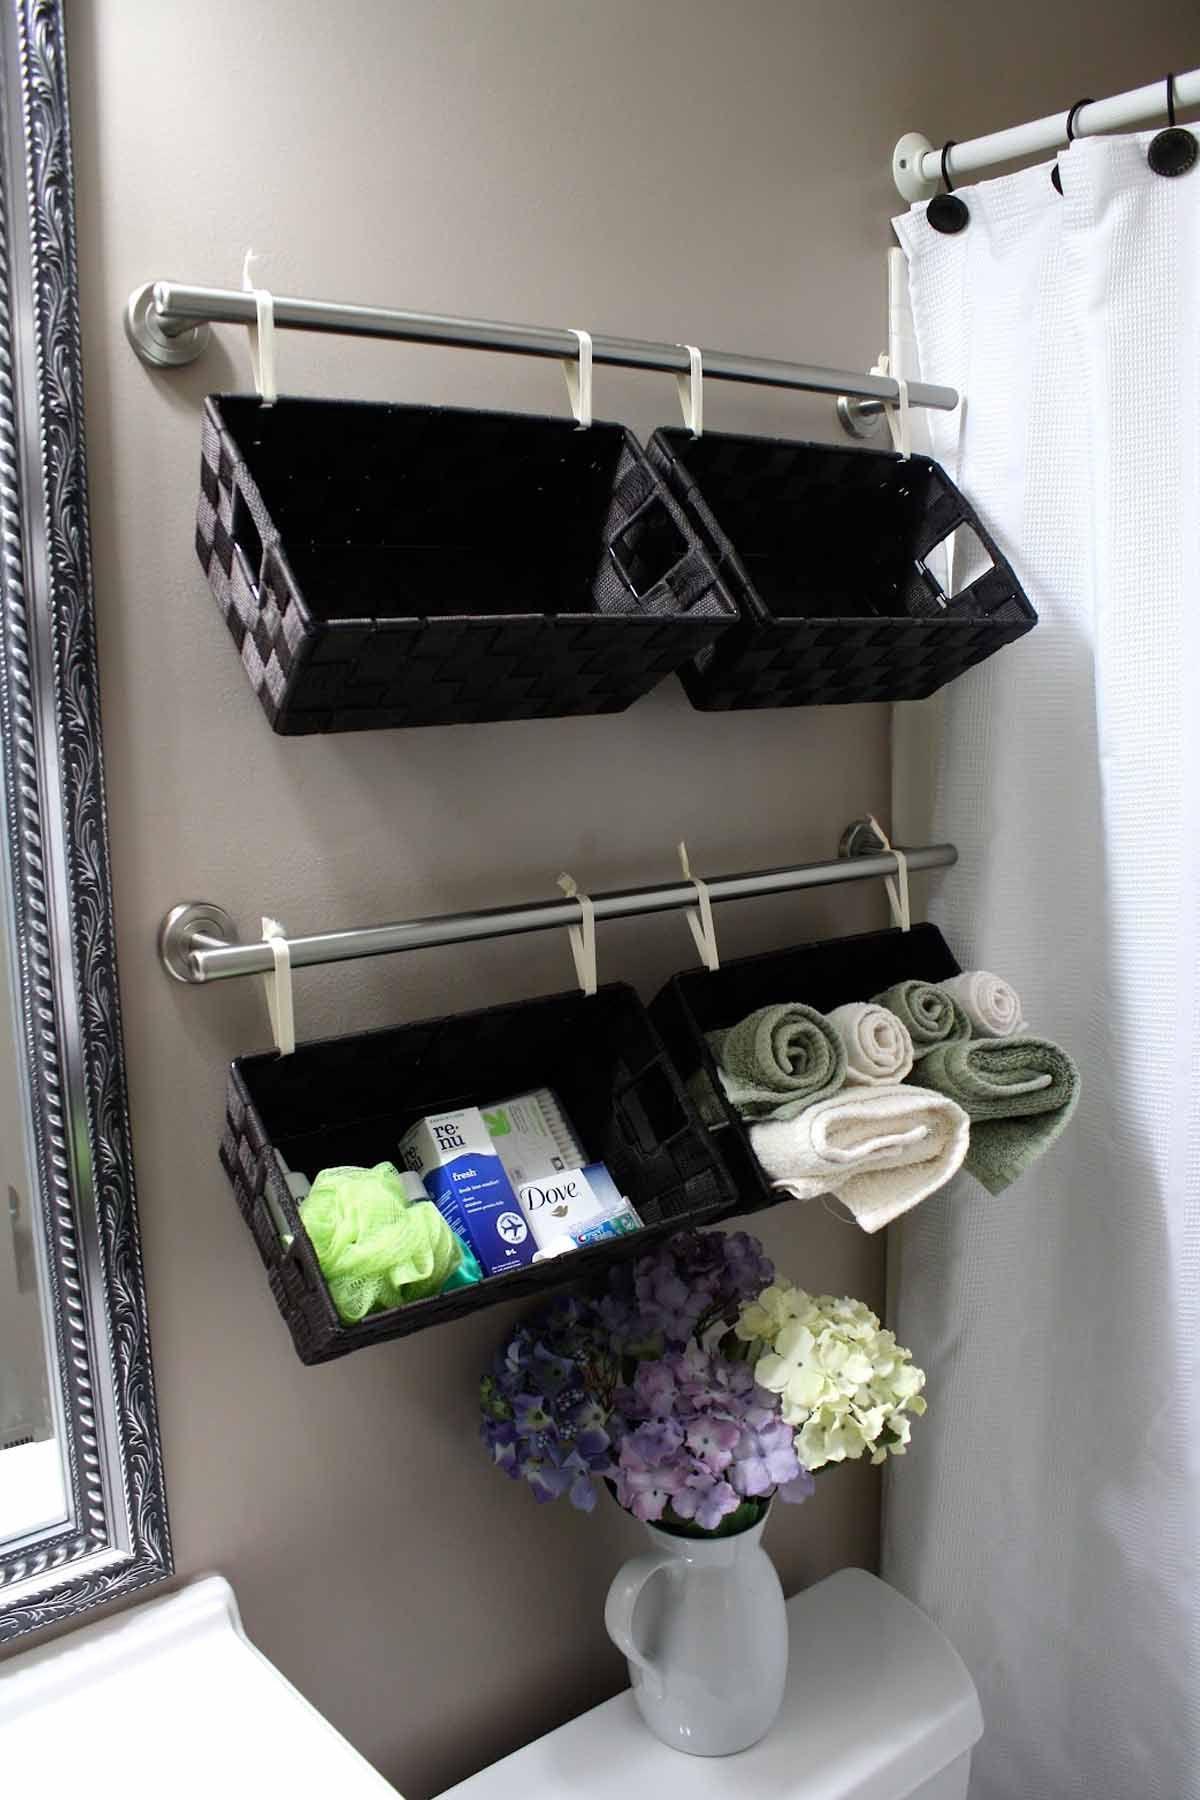 3rd Floor Bathroom Shelf Wall Hanging Shelf Rectangular Storage Shelf for Shower Room with Towel Rail Hook Creative Bathroom Shelf